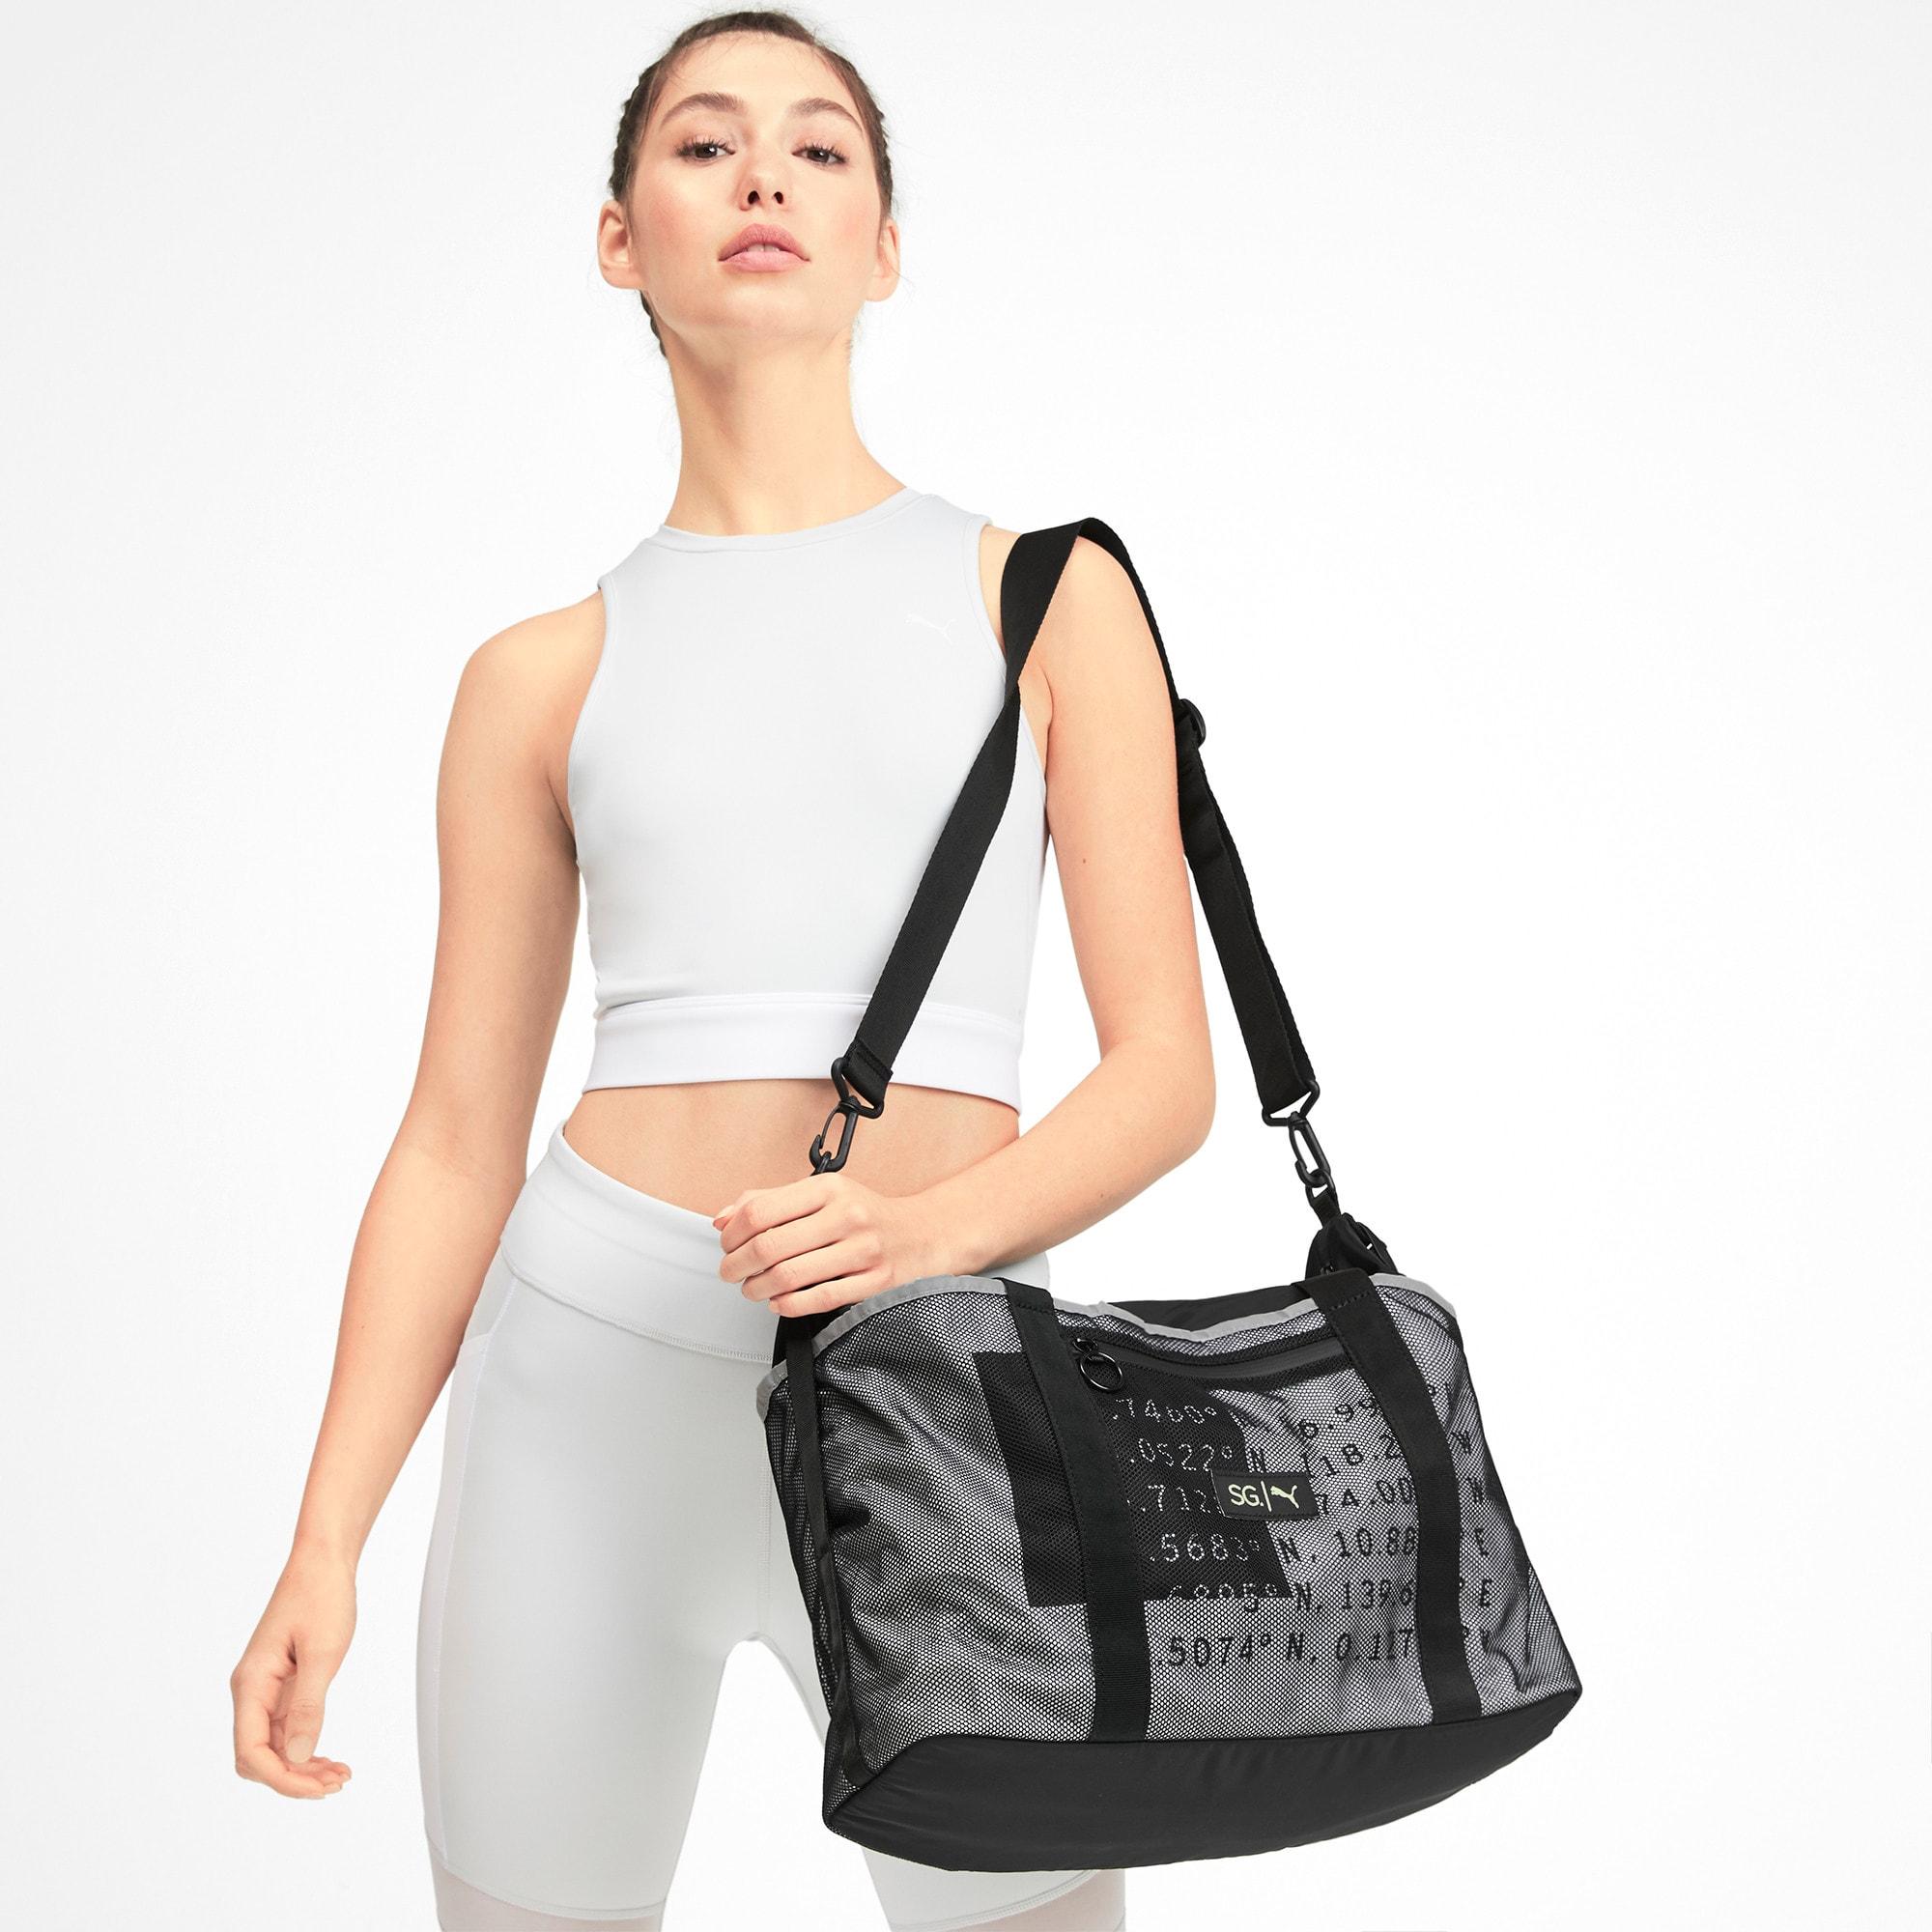 Thumbnail 2 of PUMA x SELENA GOMEZ Women's Sport Duffle Bag, Puma Black, medium